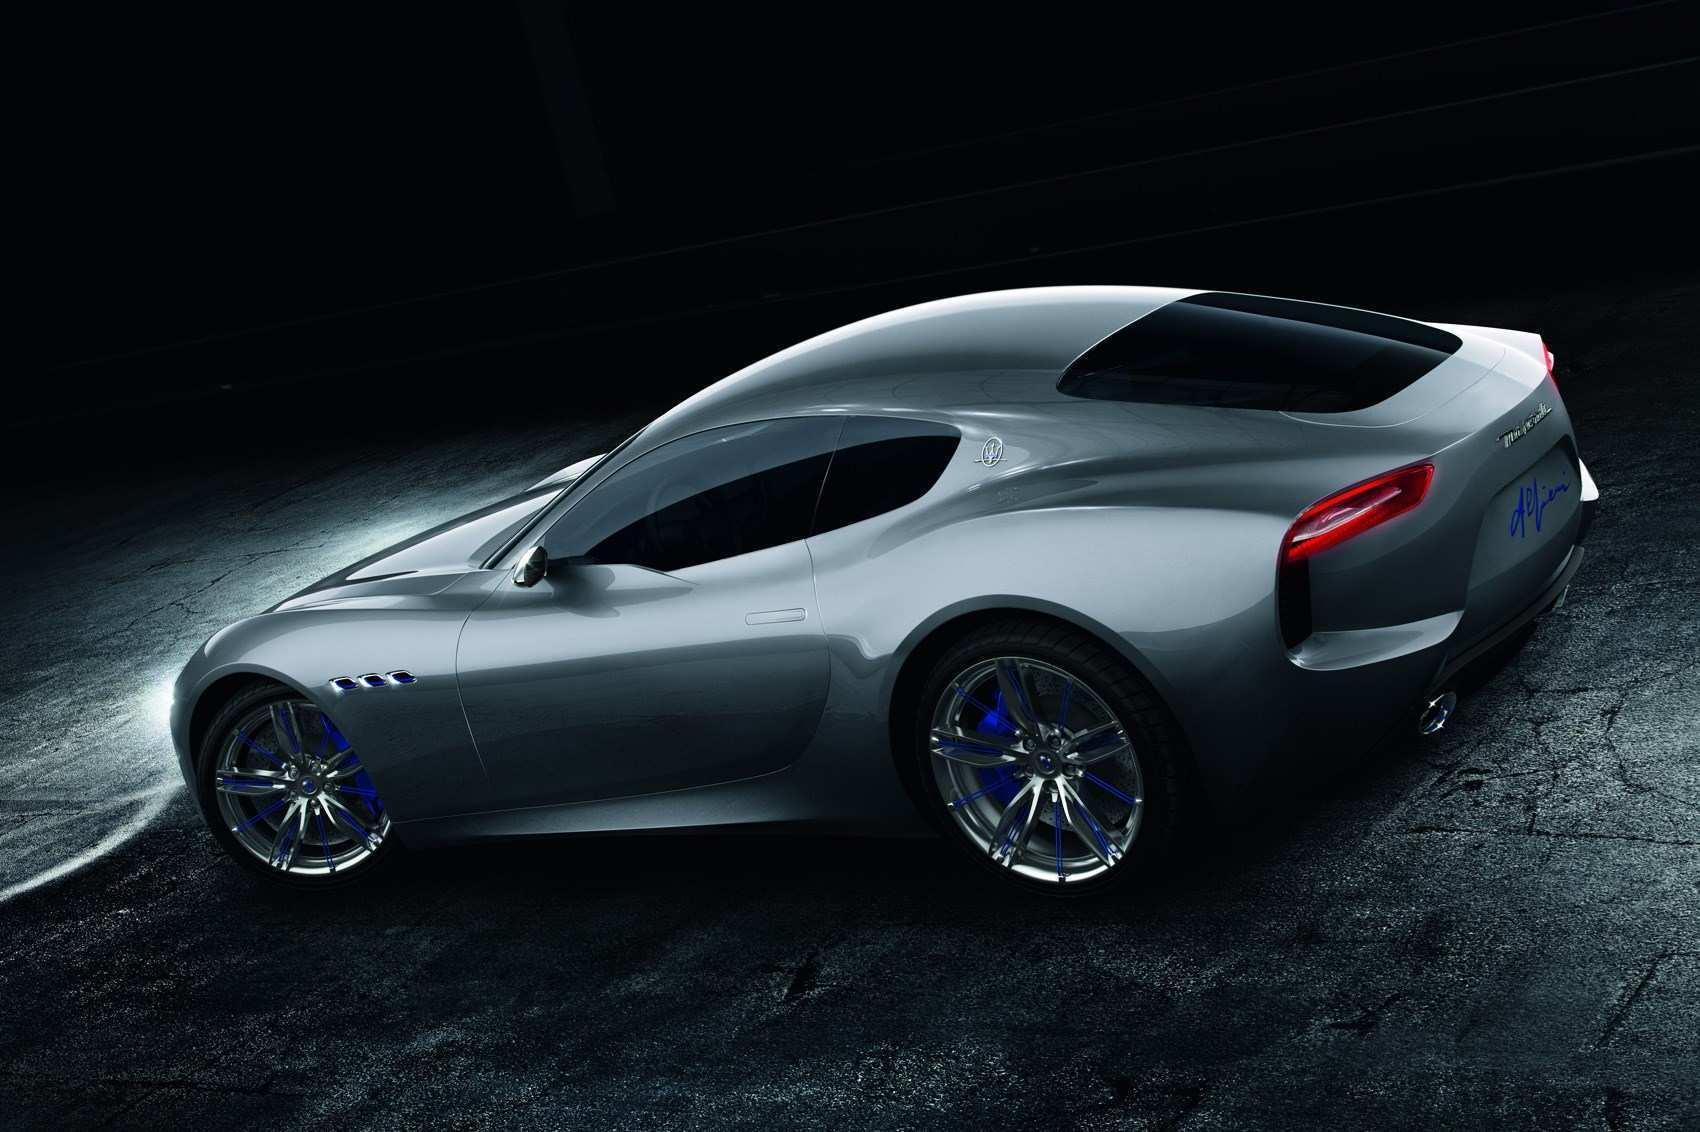 28 New New Maserati 2020 Style with New Maserati 2020